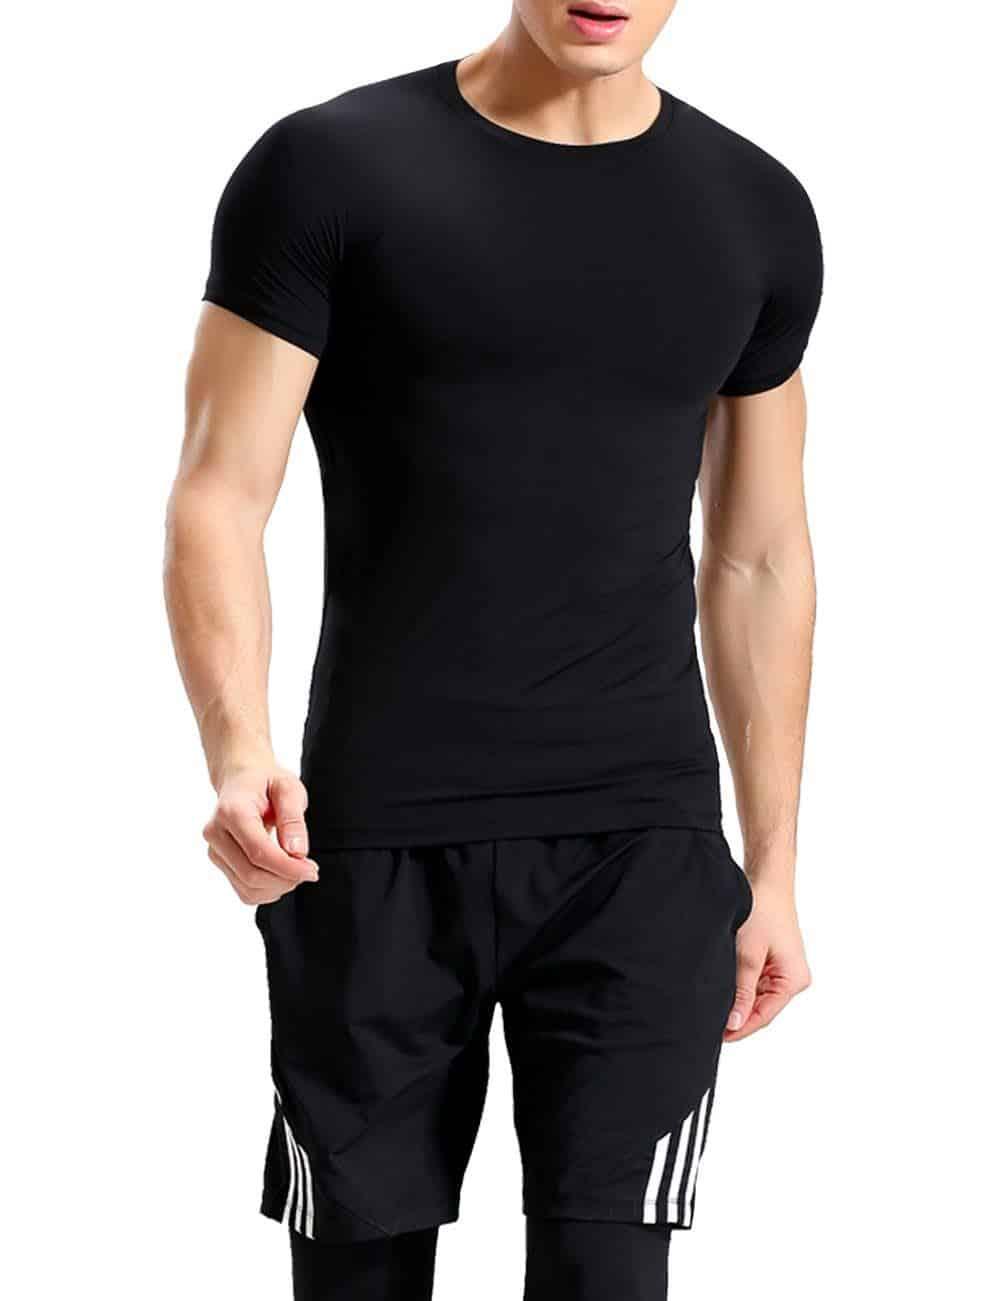 Lavento Black Crew Neck Moisture Wicking Undershirts